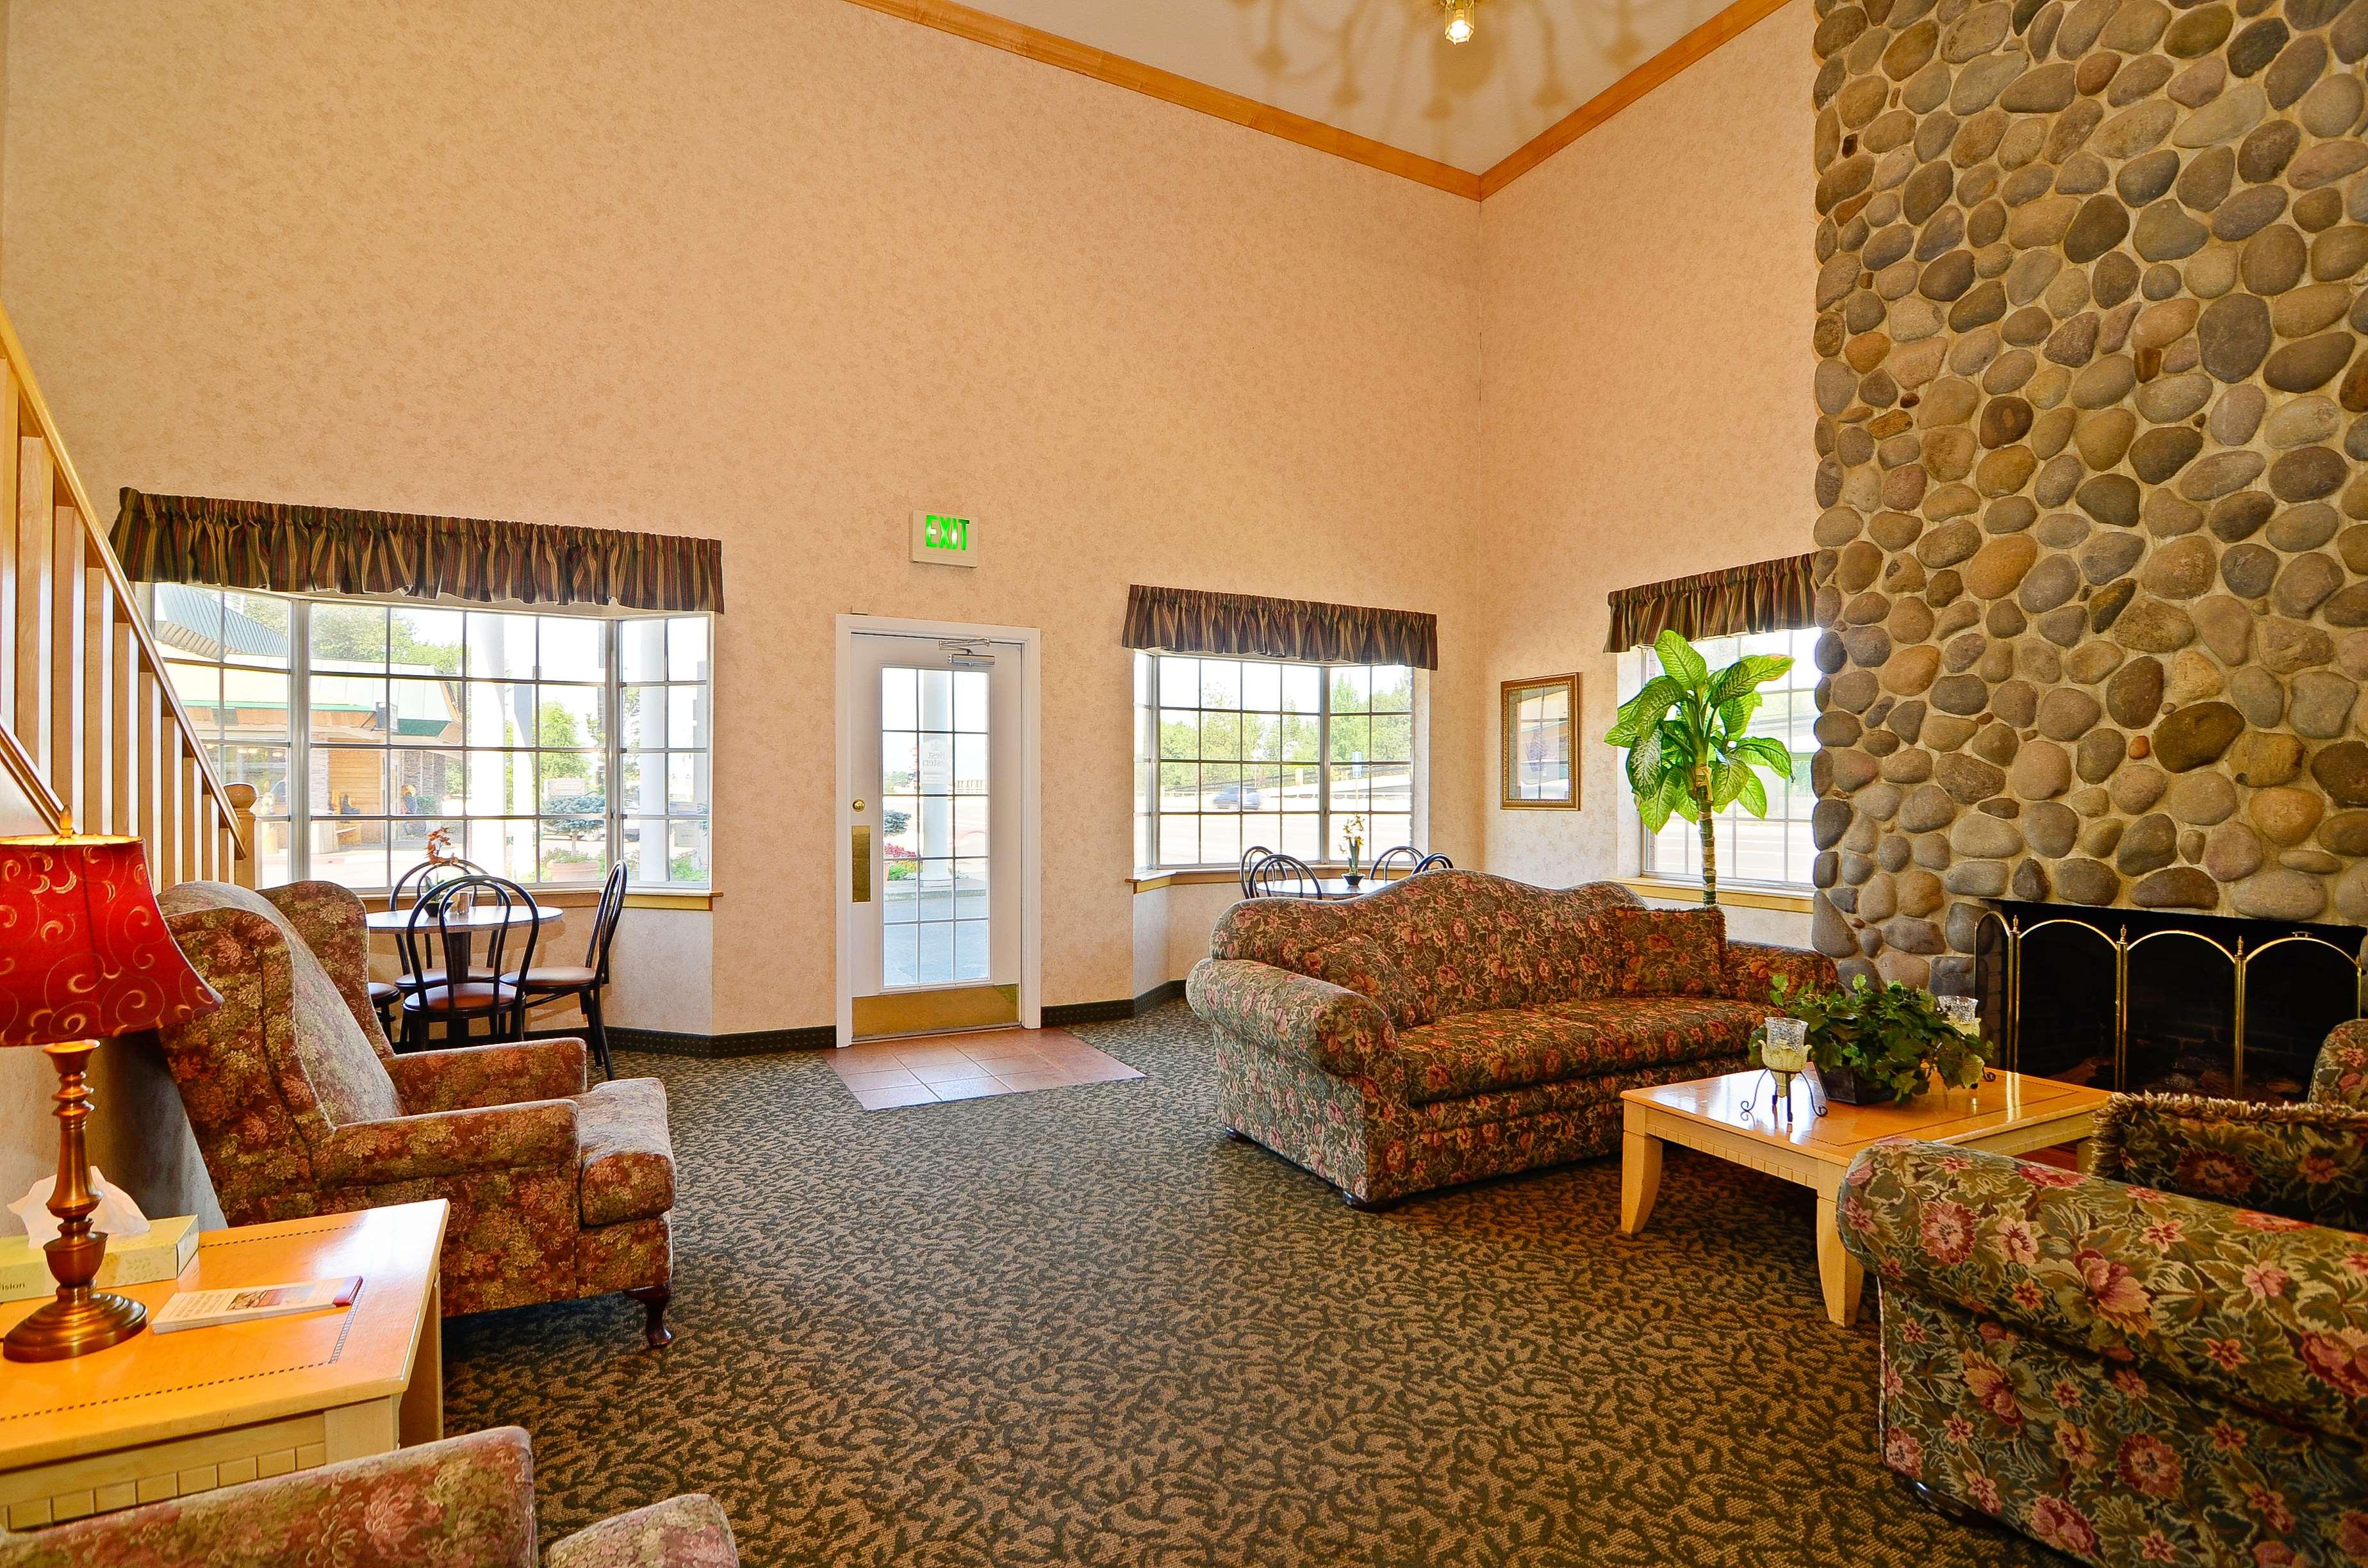 Best Western Horizon Inn image 42